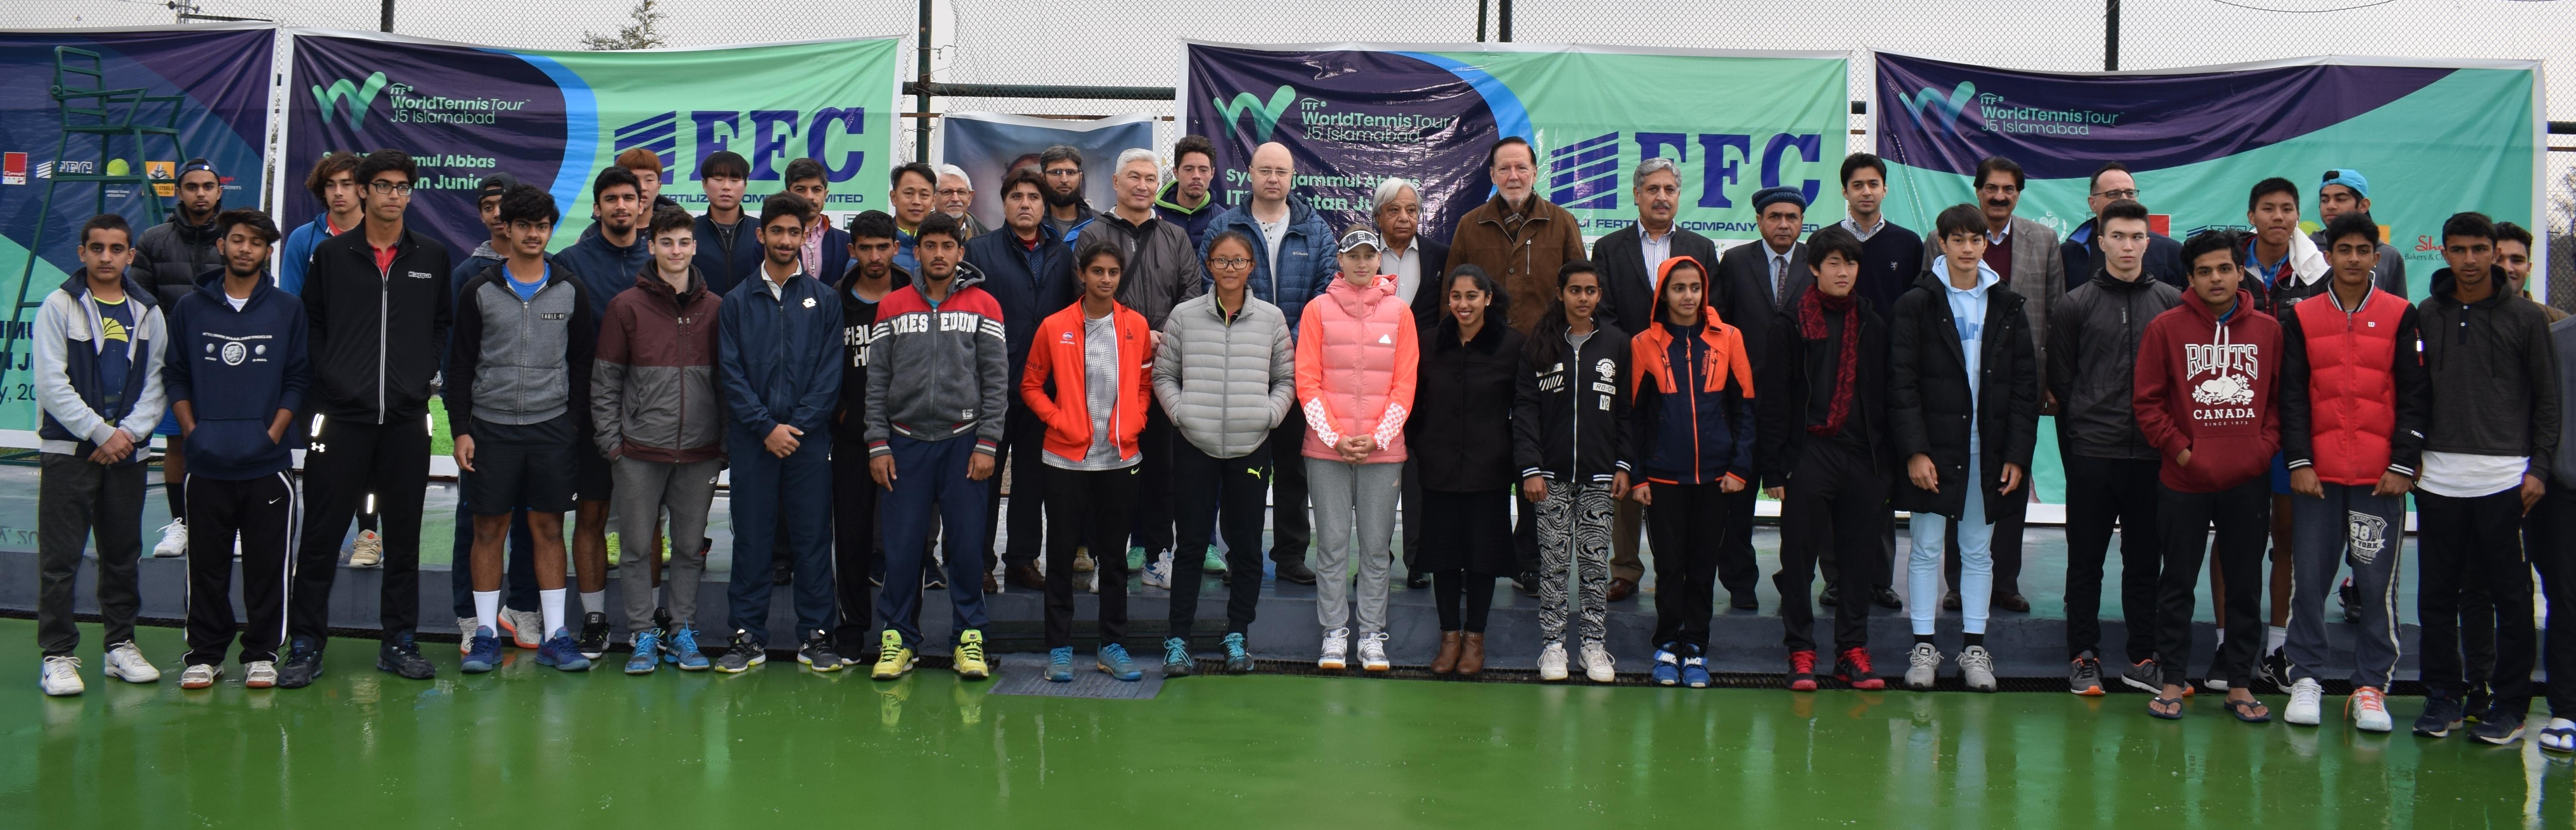 Tennis C'ship 2019